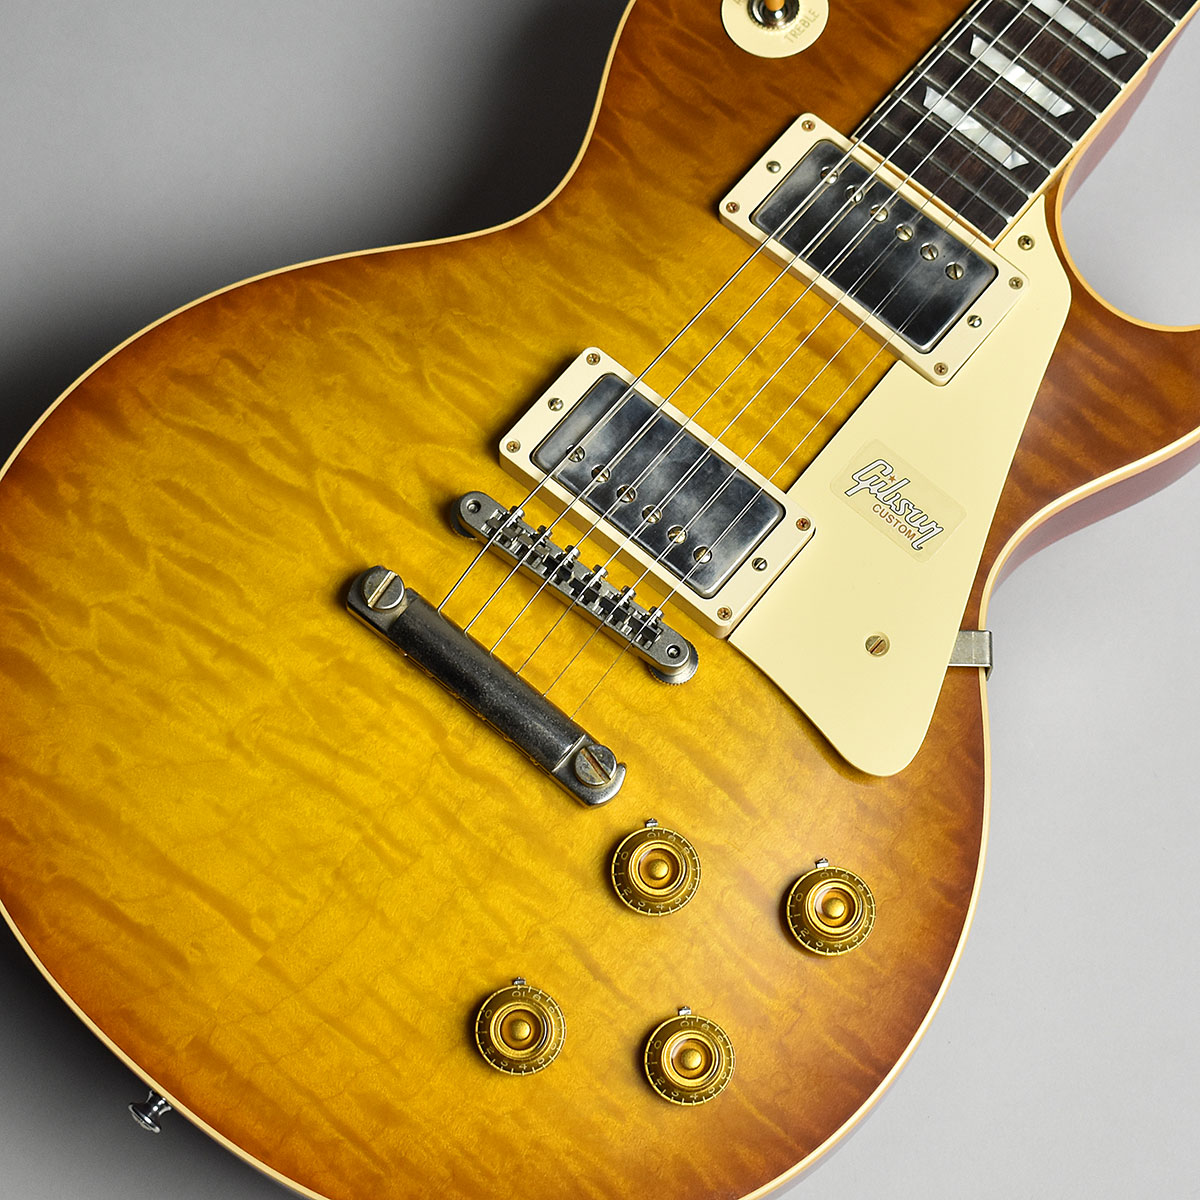 Gibson Custom Shop 1959 Les Paul Standard Royal Teaburst VOS S/N:983067 【2018 Historic Collection】 【ギブソン カスタムショップ】【未展示品】